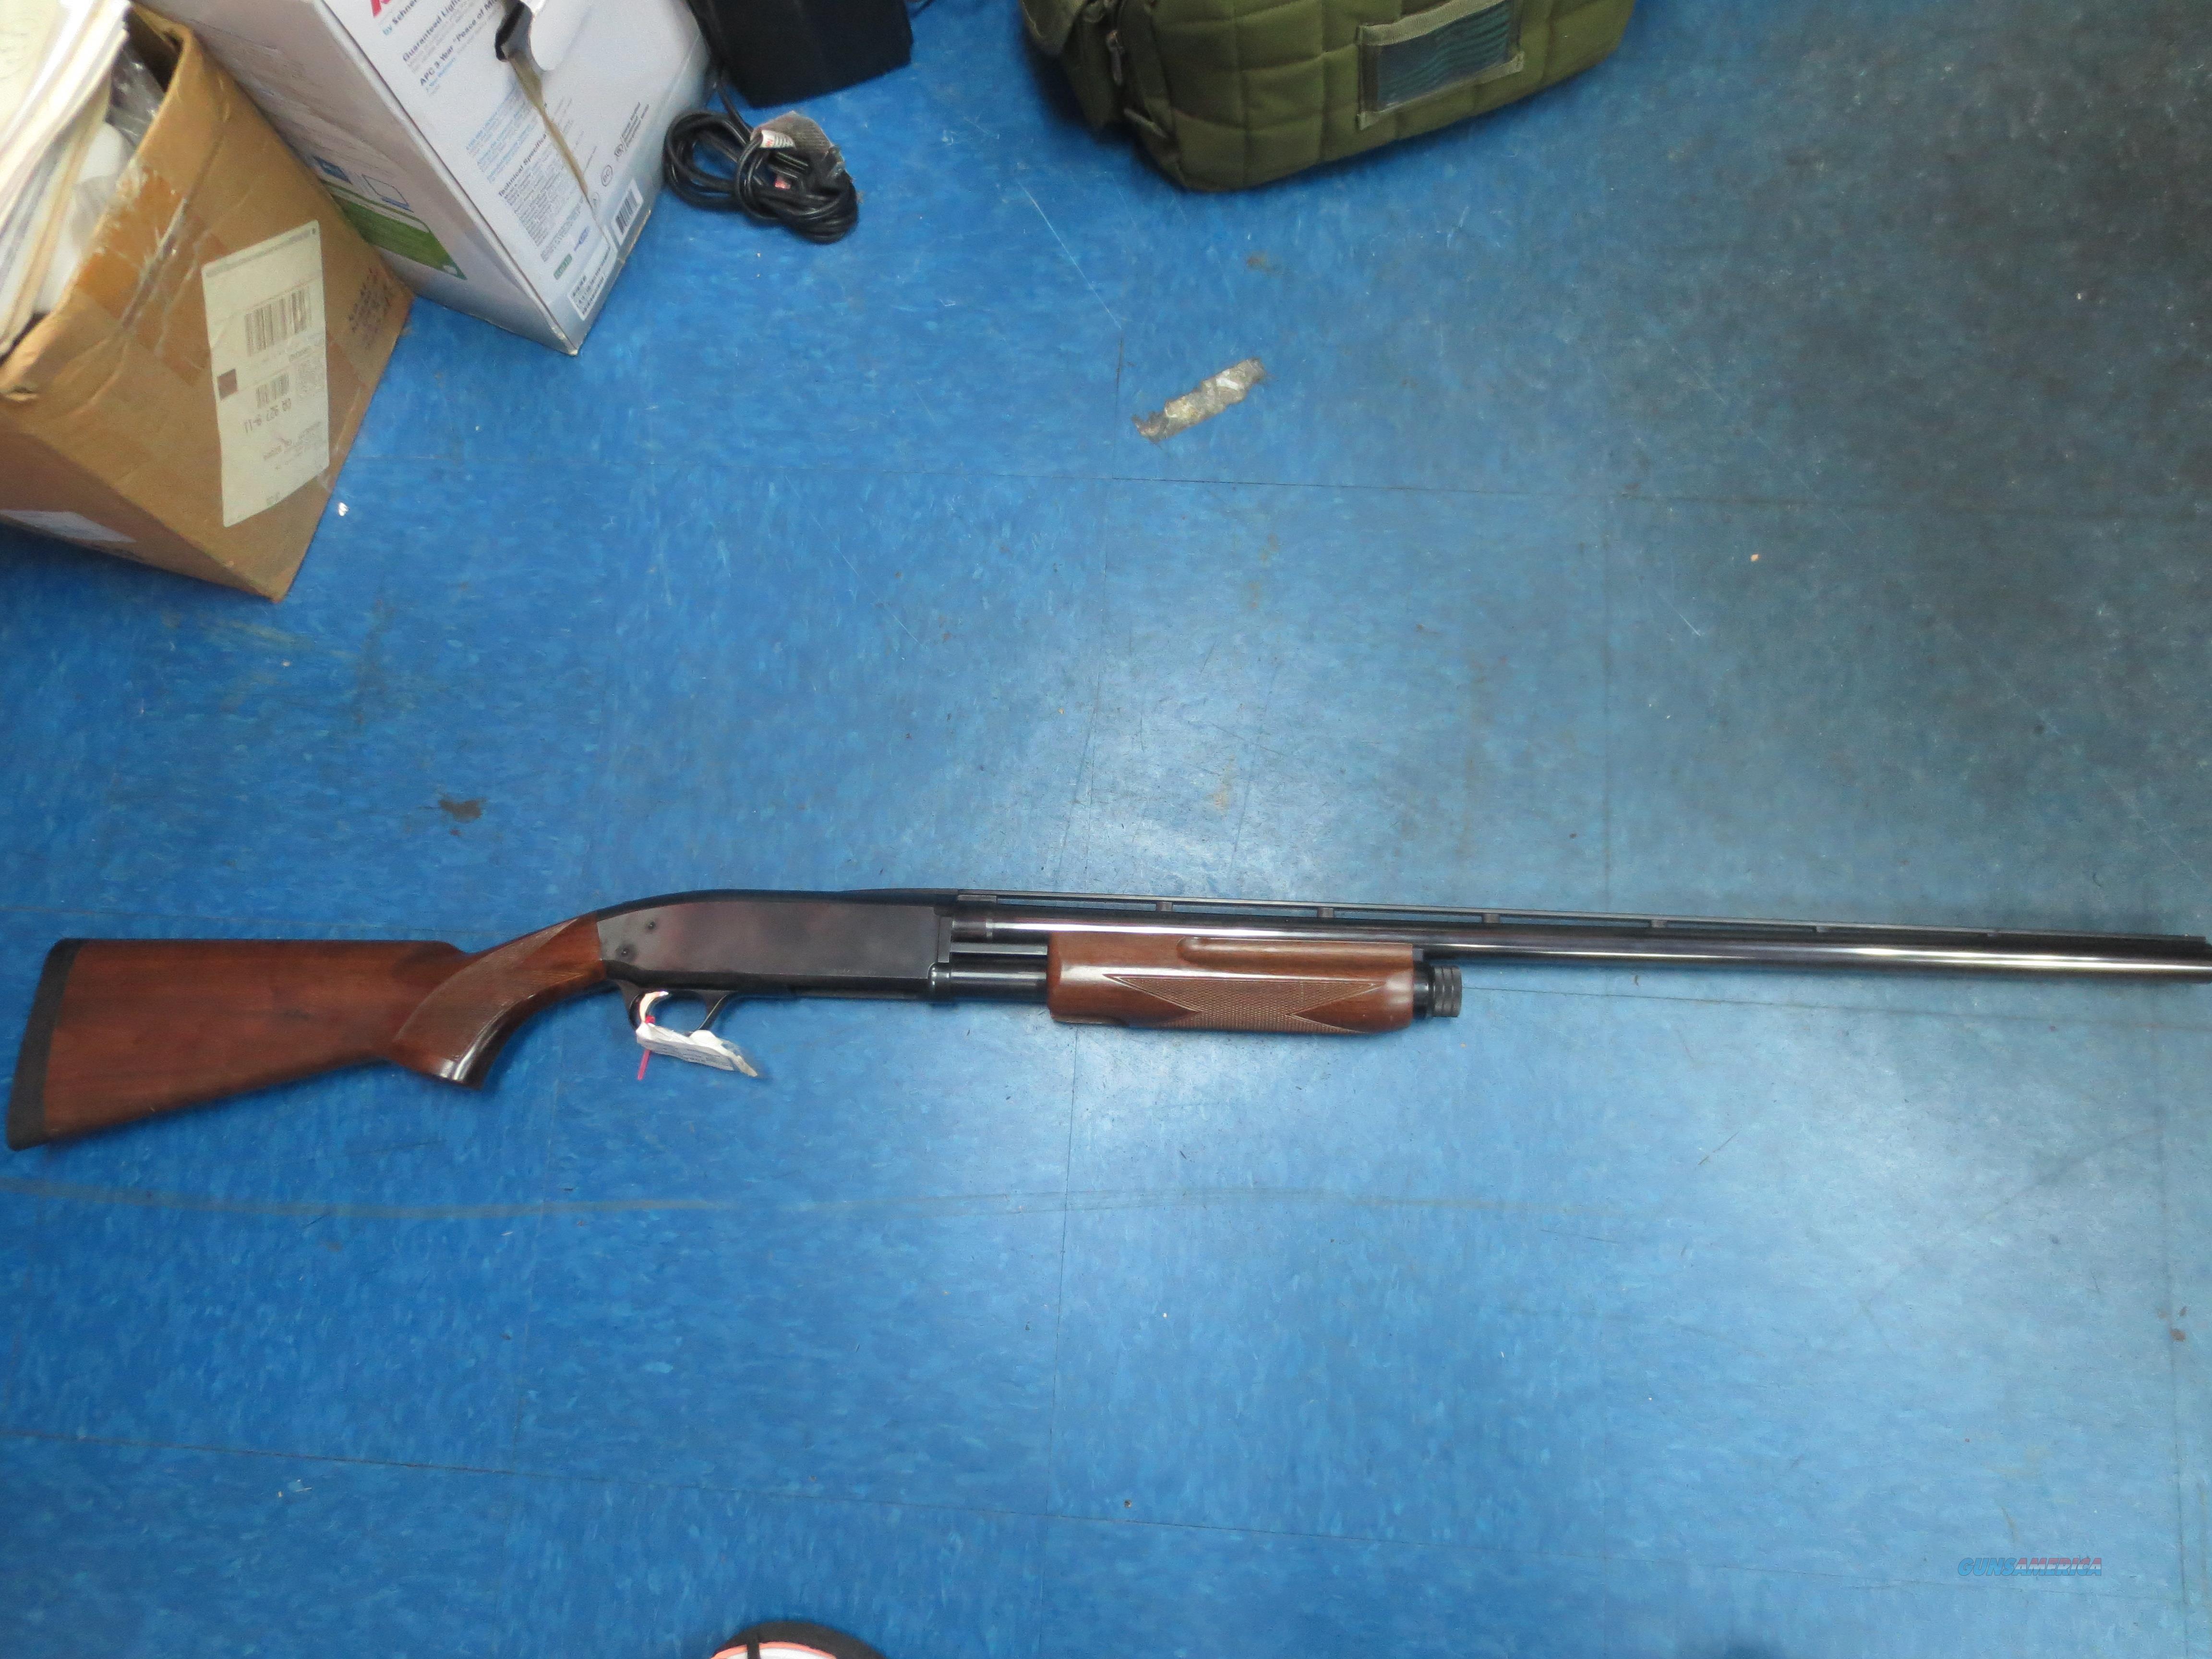 Browning BPS 12 gau shotgun w/invector choke  Guns > Shotguns > Browning Shotguns > Pump Action > Hunting